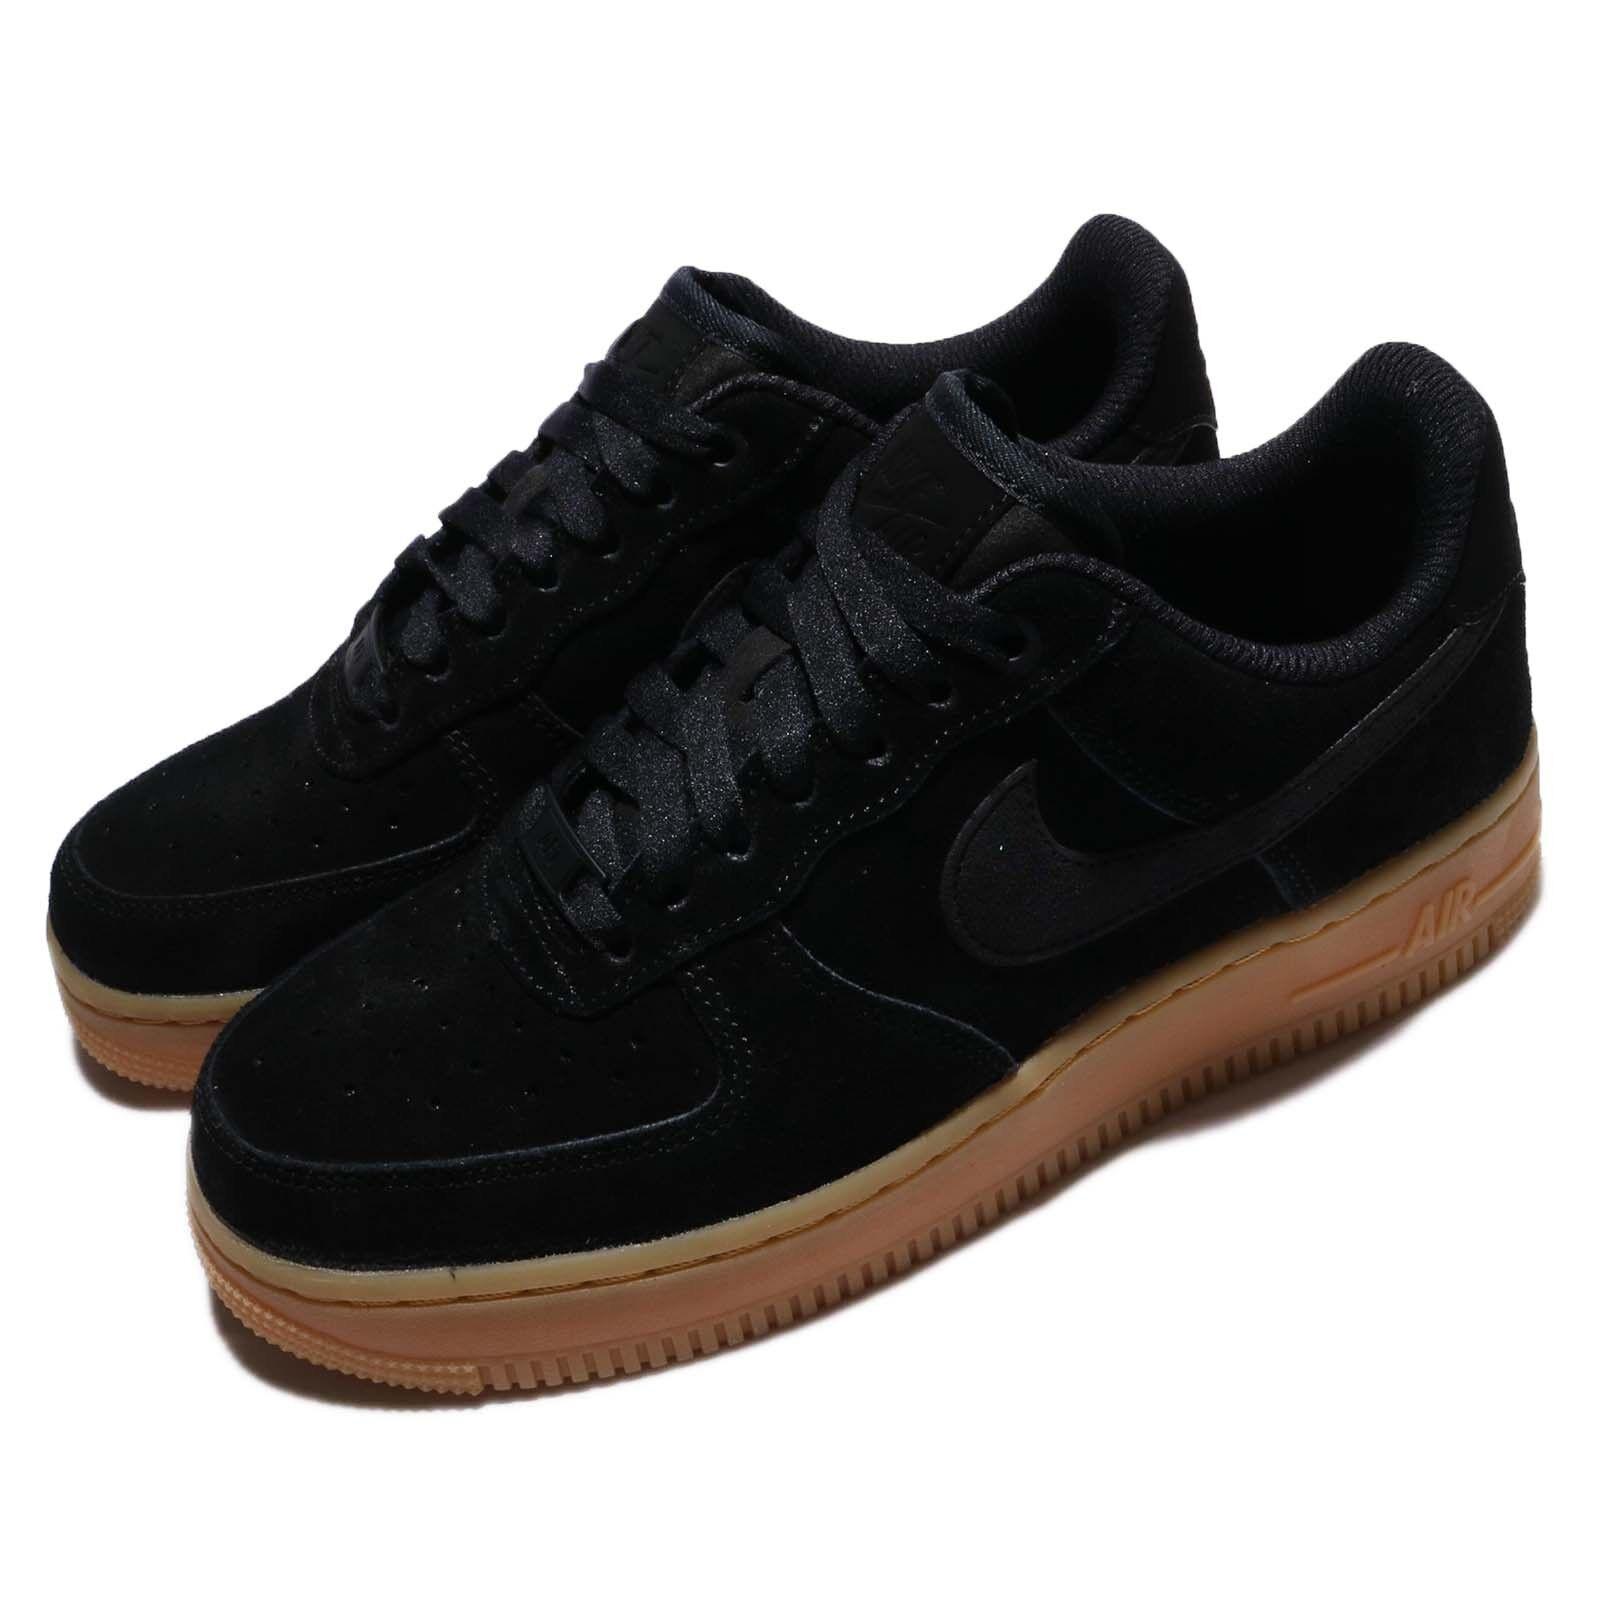 Nike Wmns Wmns Wmns Air Force 1 07 se Negro Goma Med AF1 AA0287-002 Mujeres Zapatos De Gamuza Marrón  venta mundialmente famosa en línea